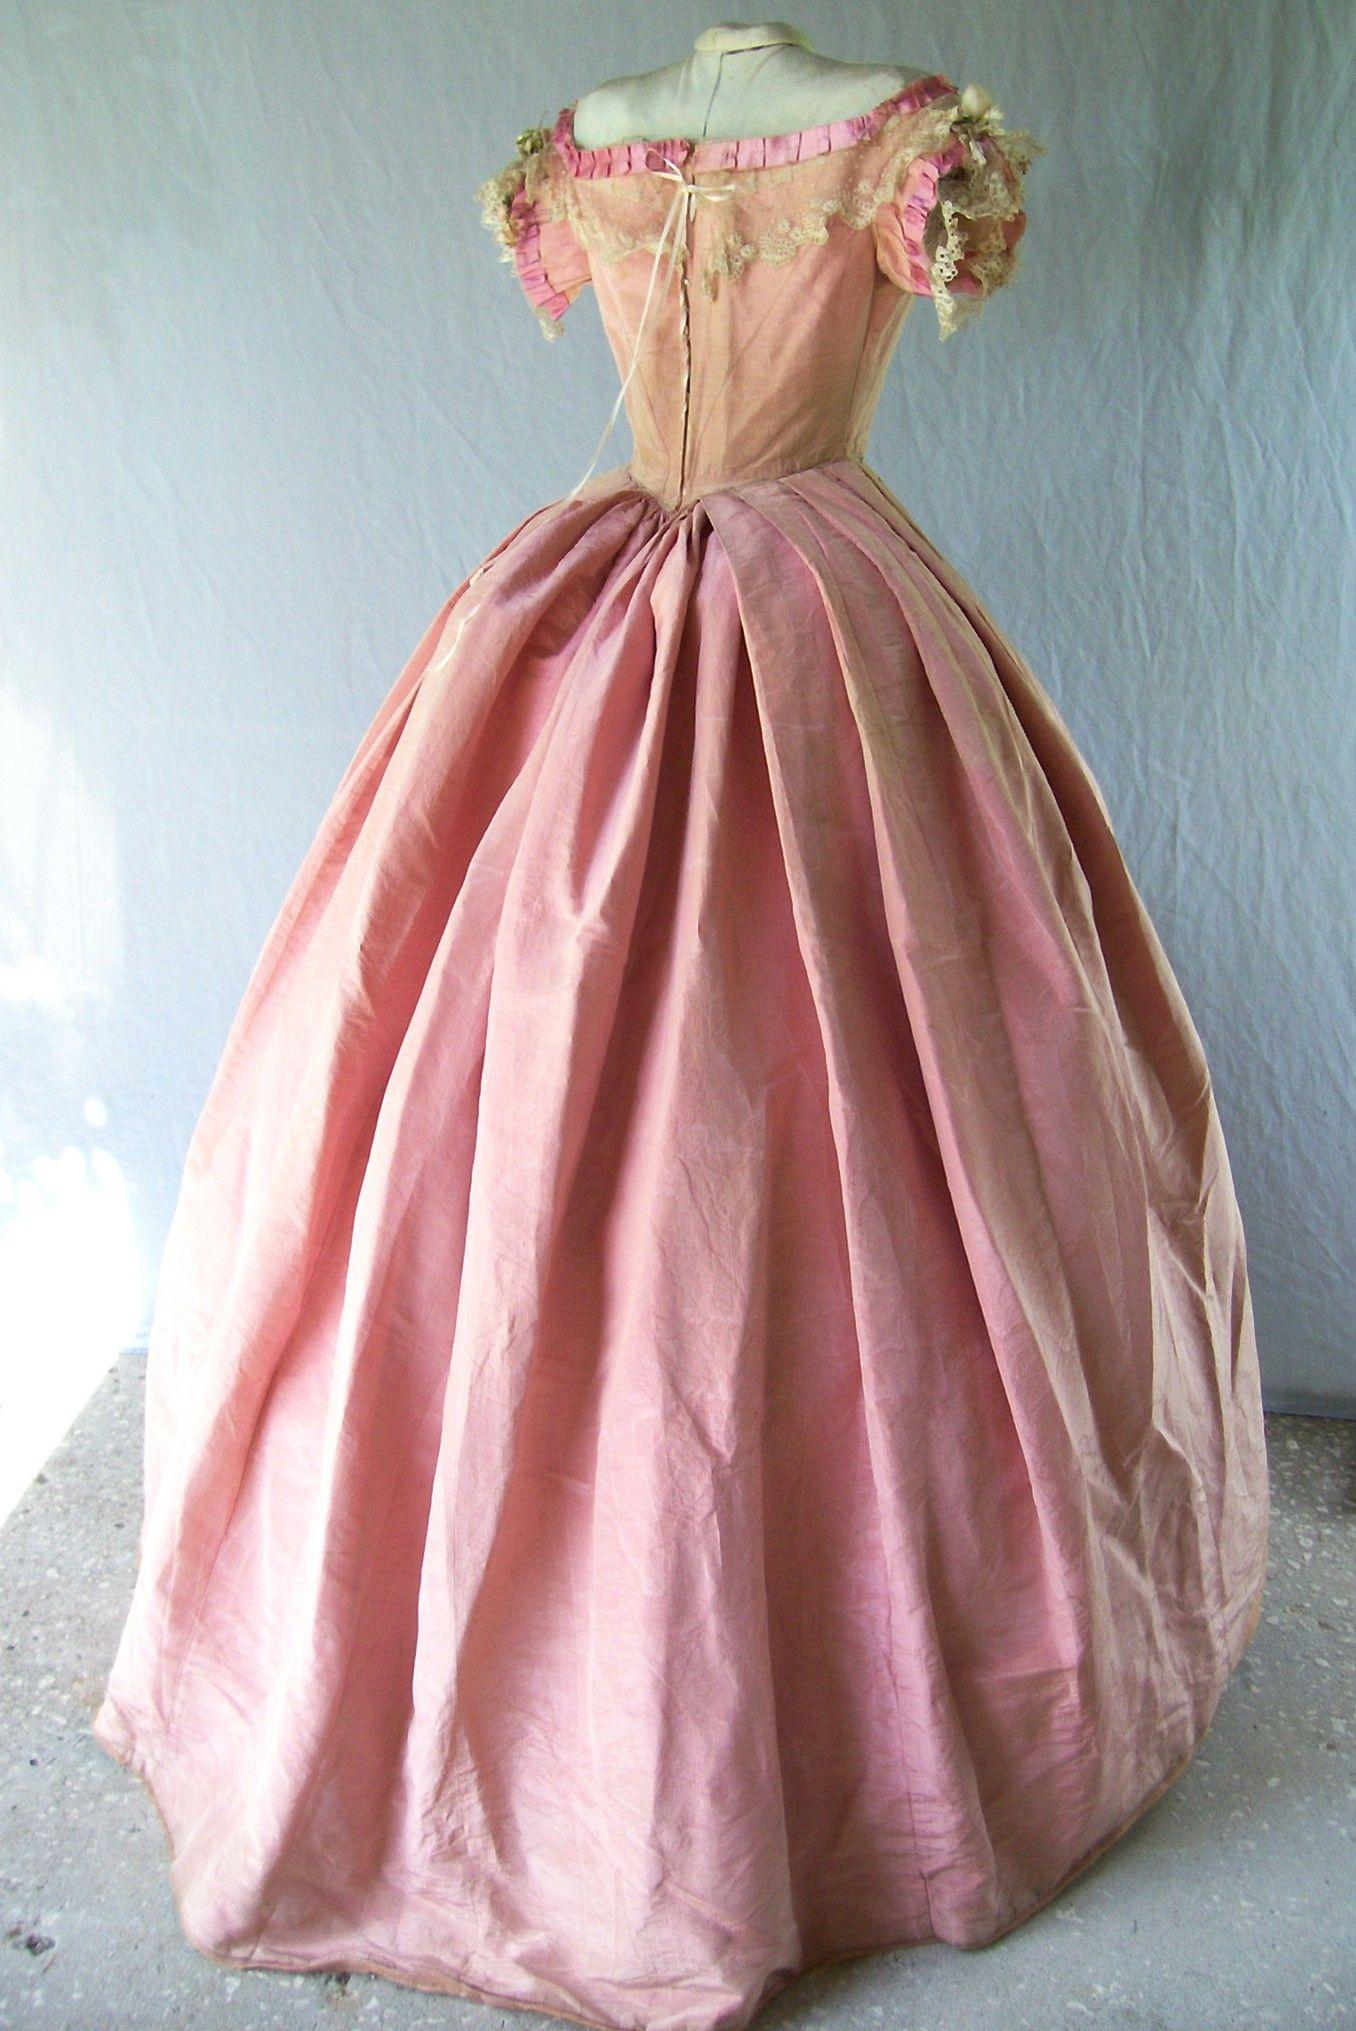 Pink moire ballgown c.1860 | Victorian Fashion | Pinterest | De ...